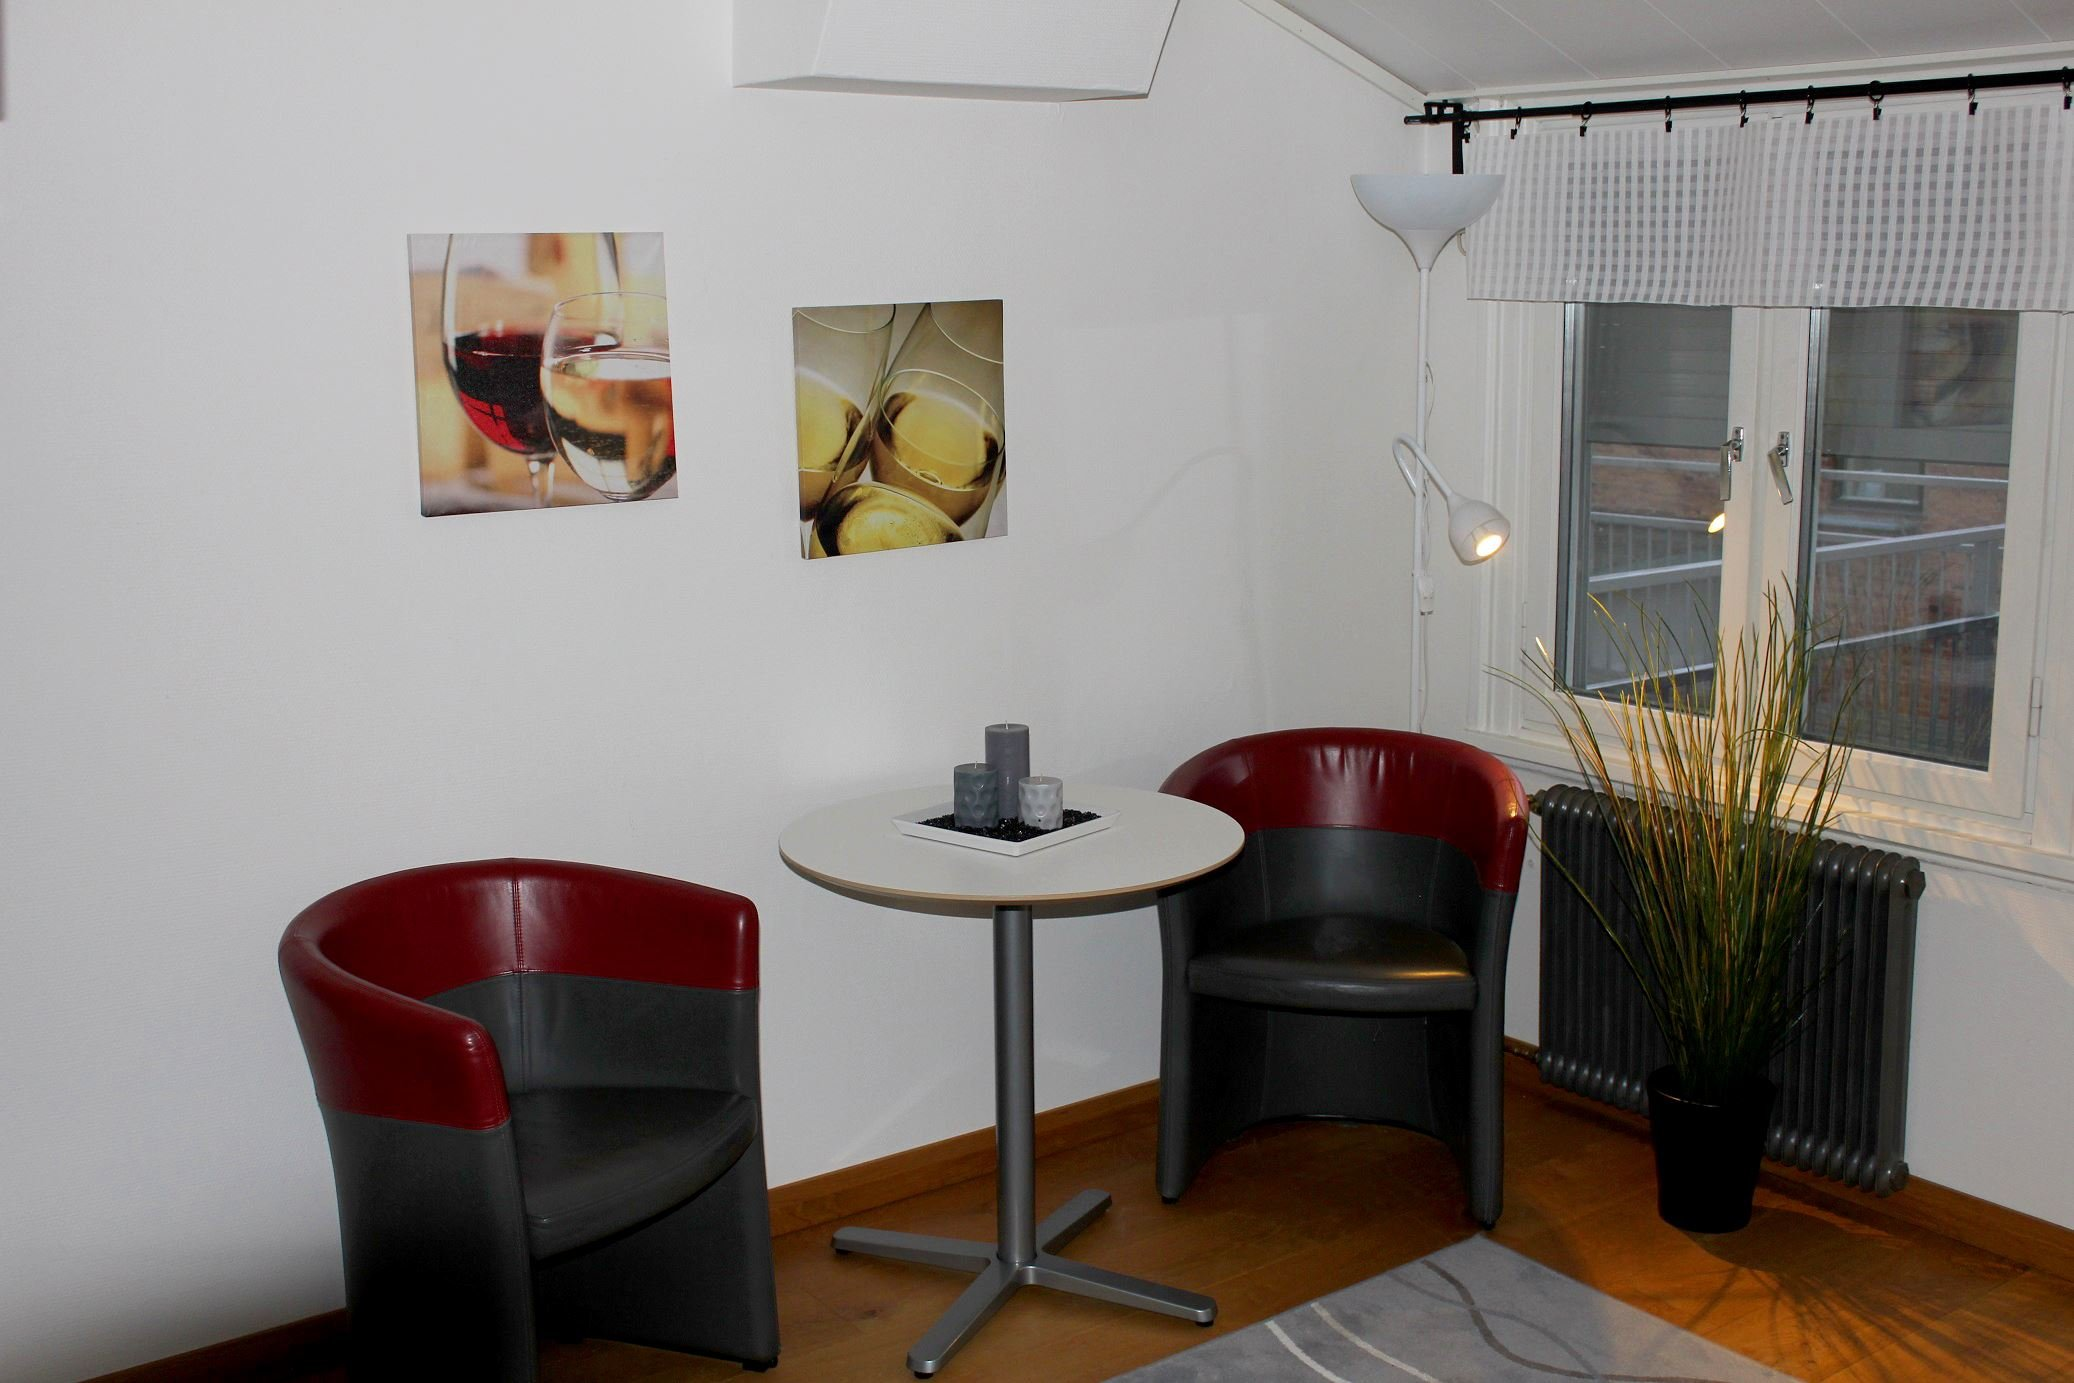 Lägenhet centrala Karlshamn